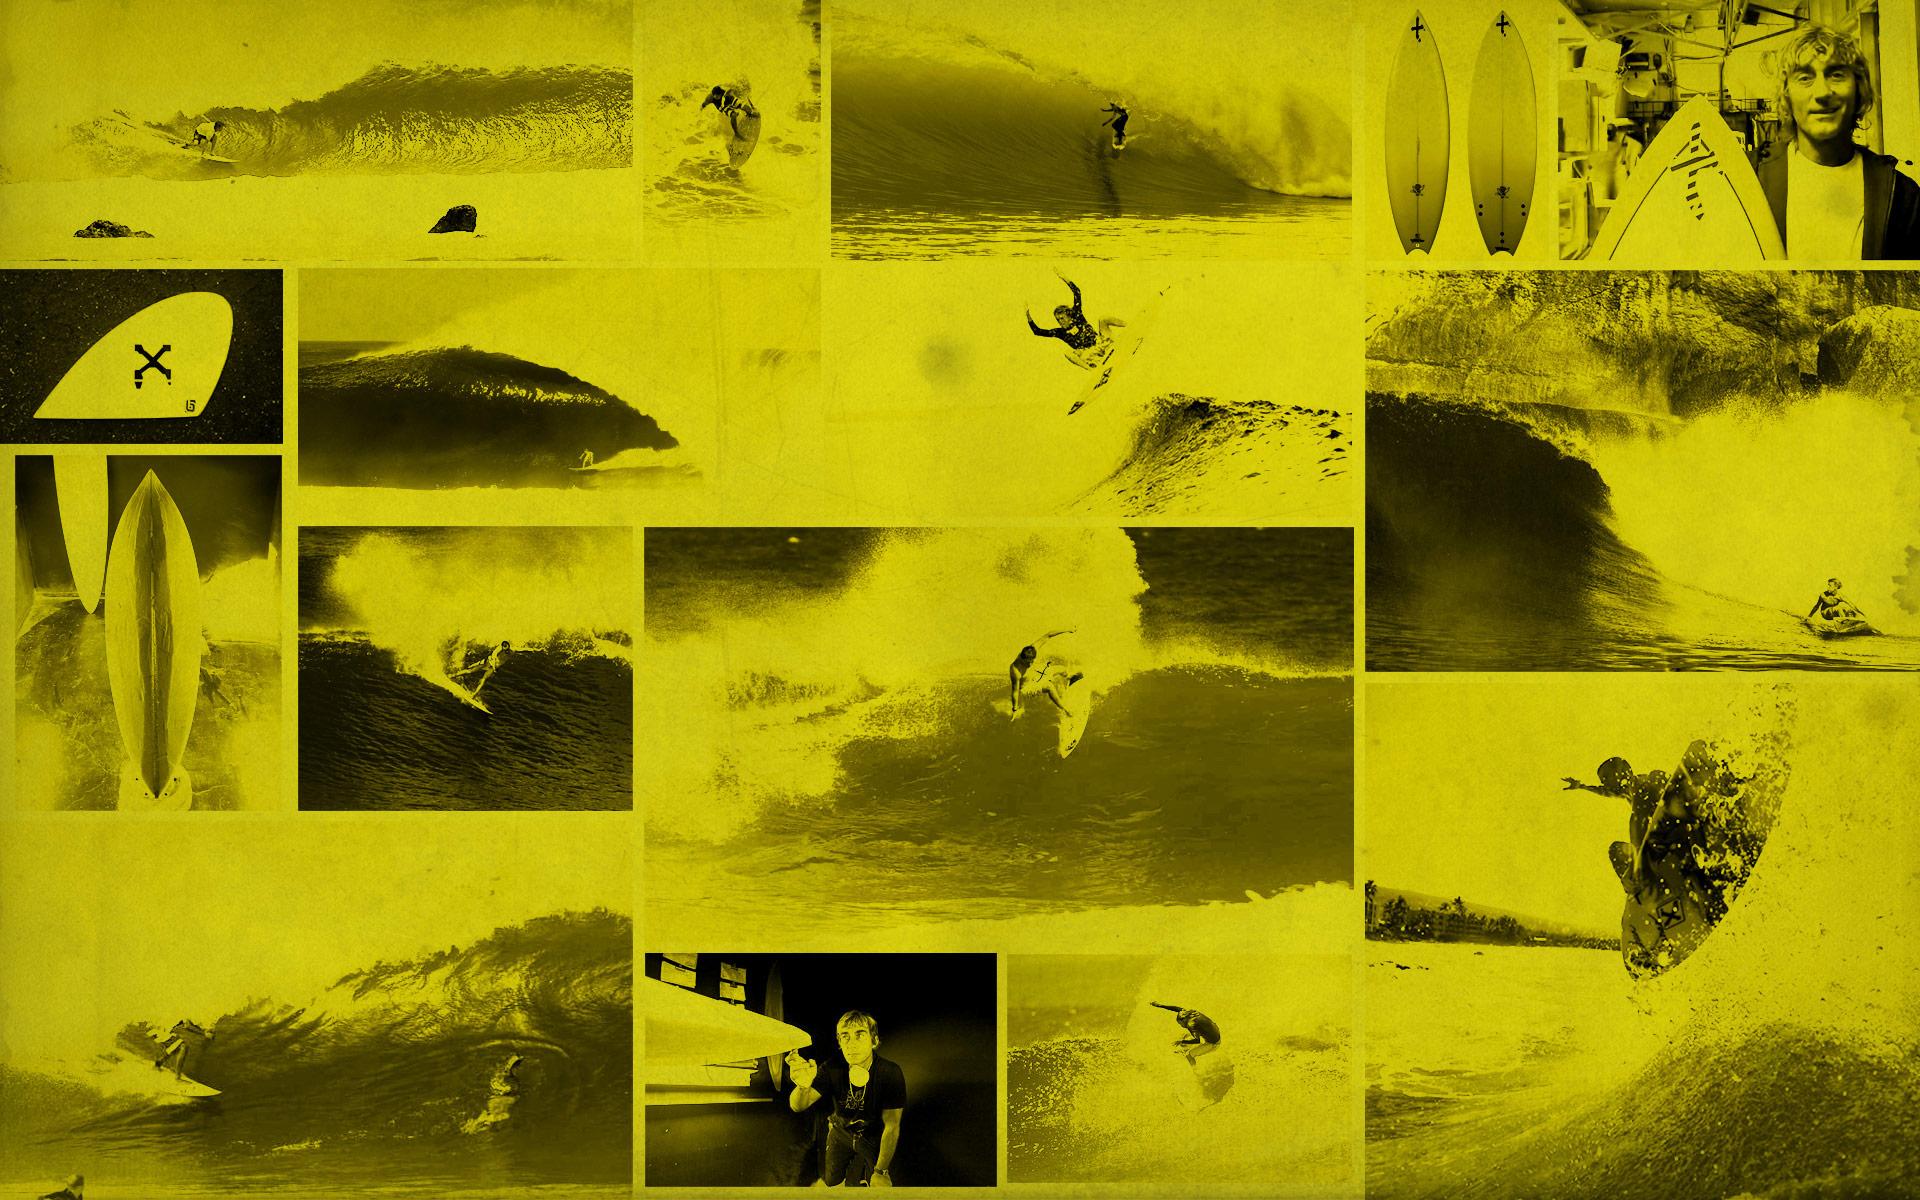 Xanadu Surf Designs - High Performance Surfboards